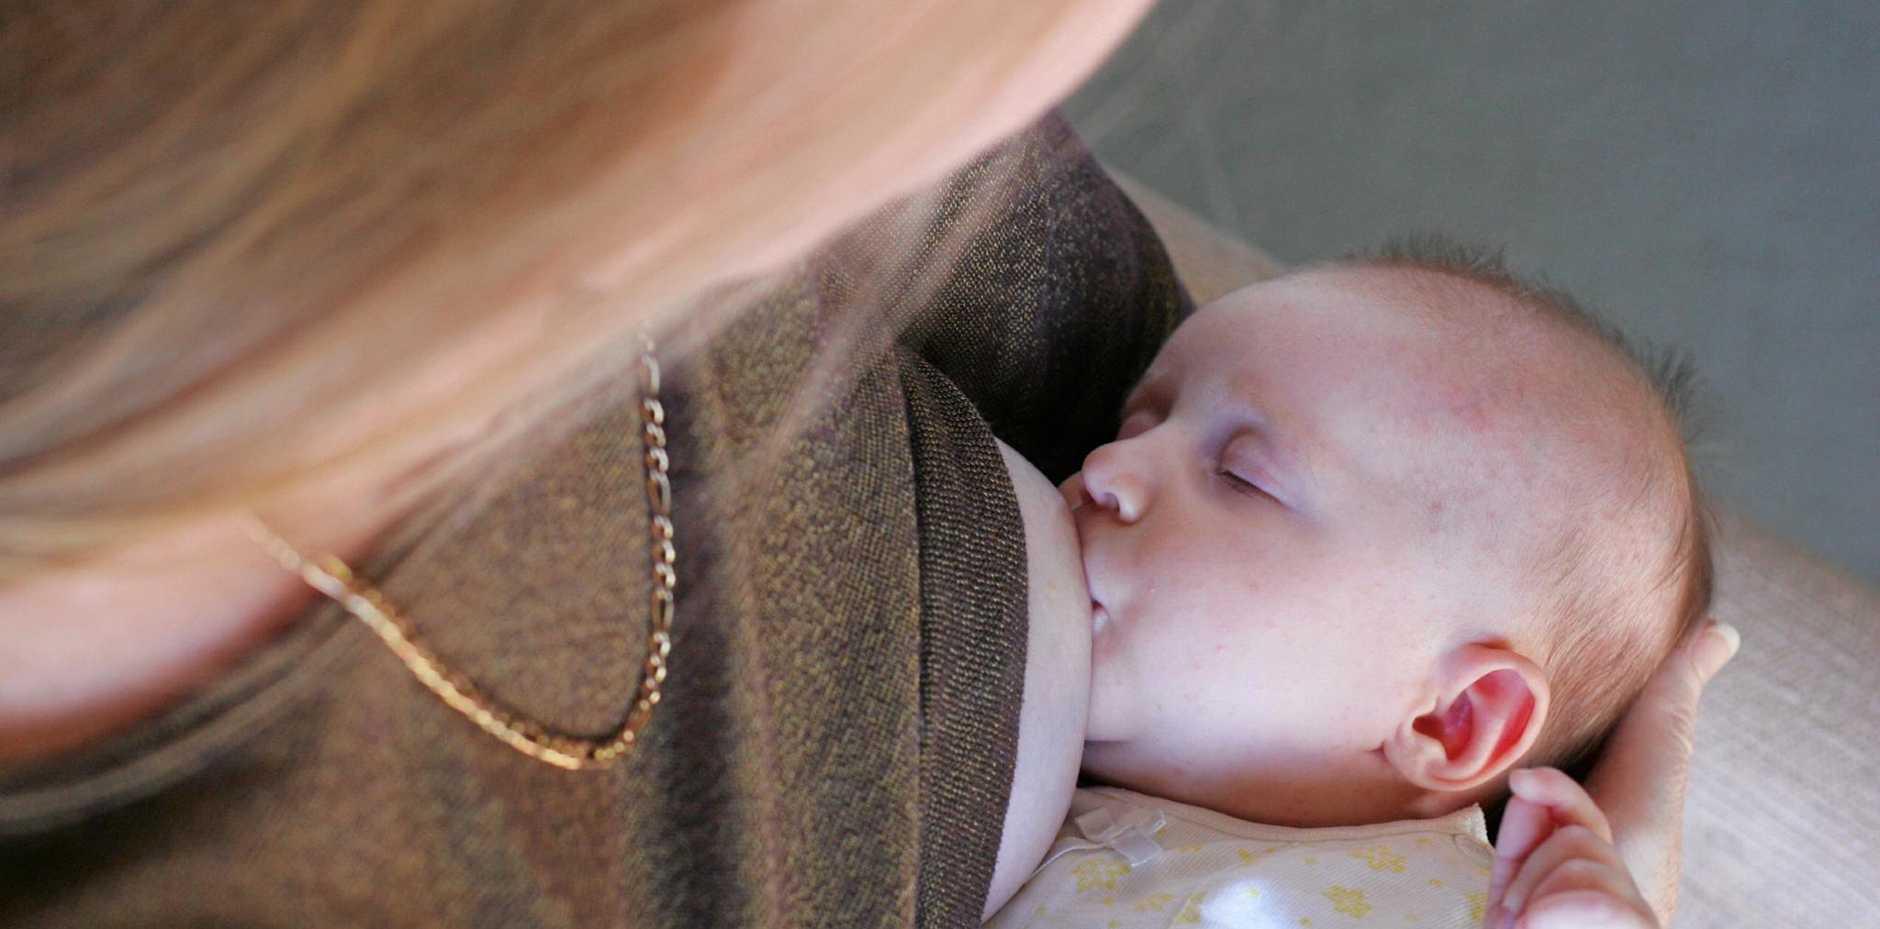 Human Milk 4 Human Babies (HM4HB) is a global breast milk sharing network.